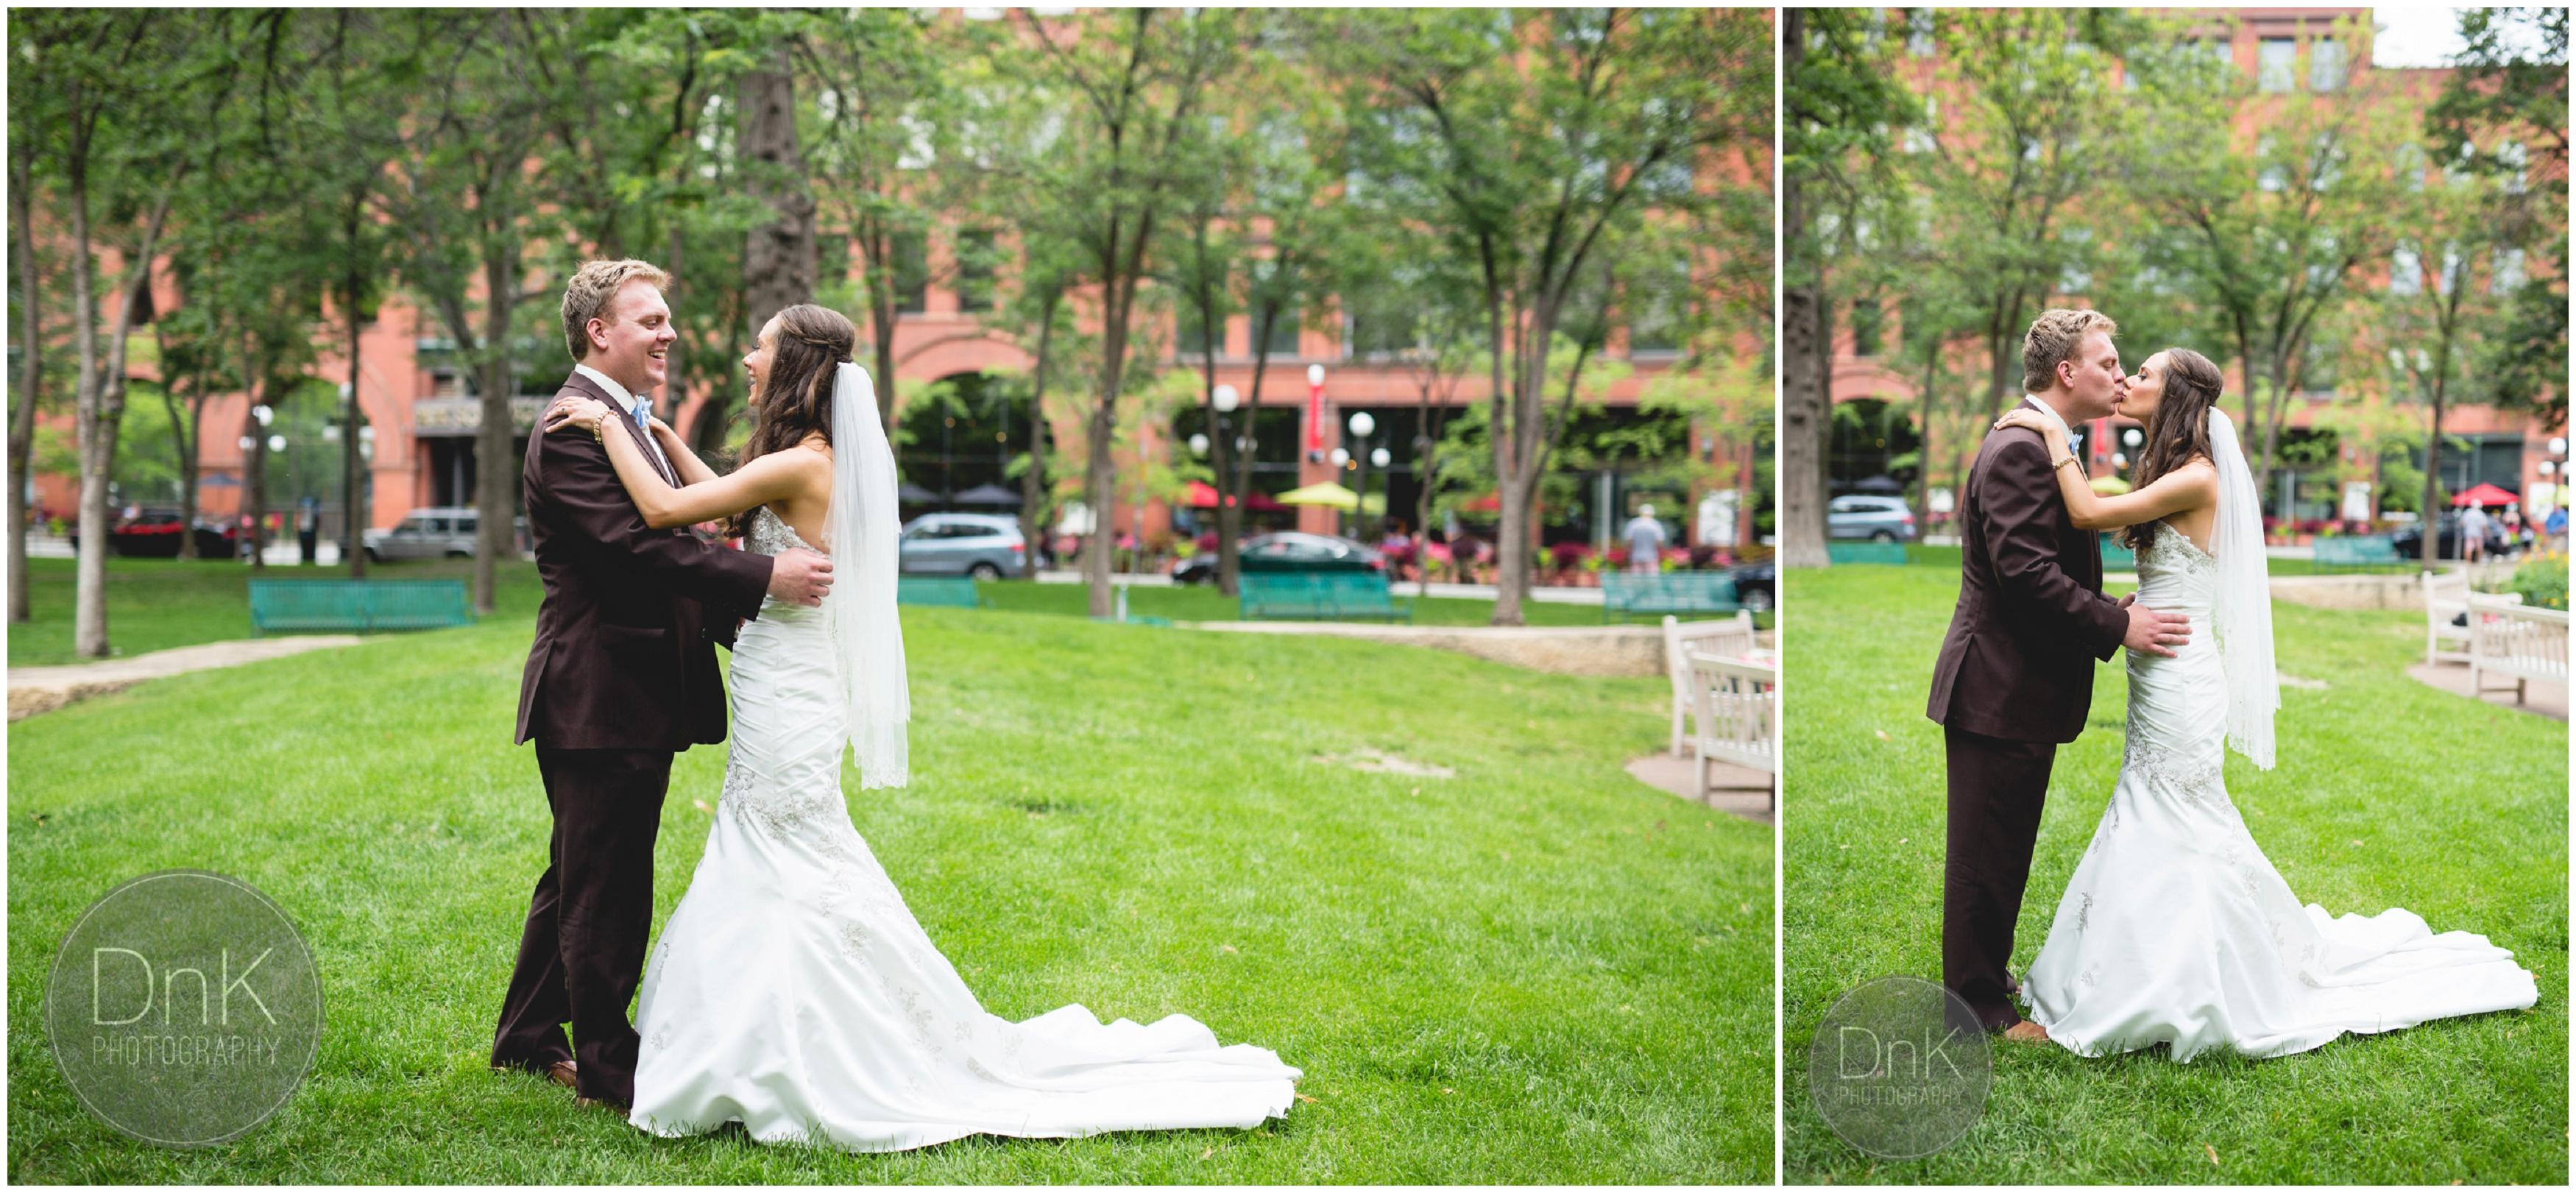 08 - Mears Park Wedding Photos Minneapolis Wedding Photographer